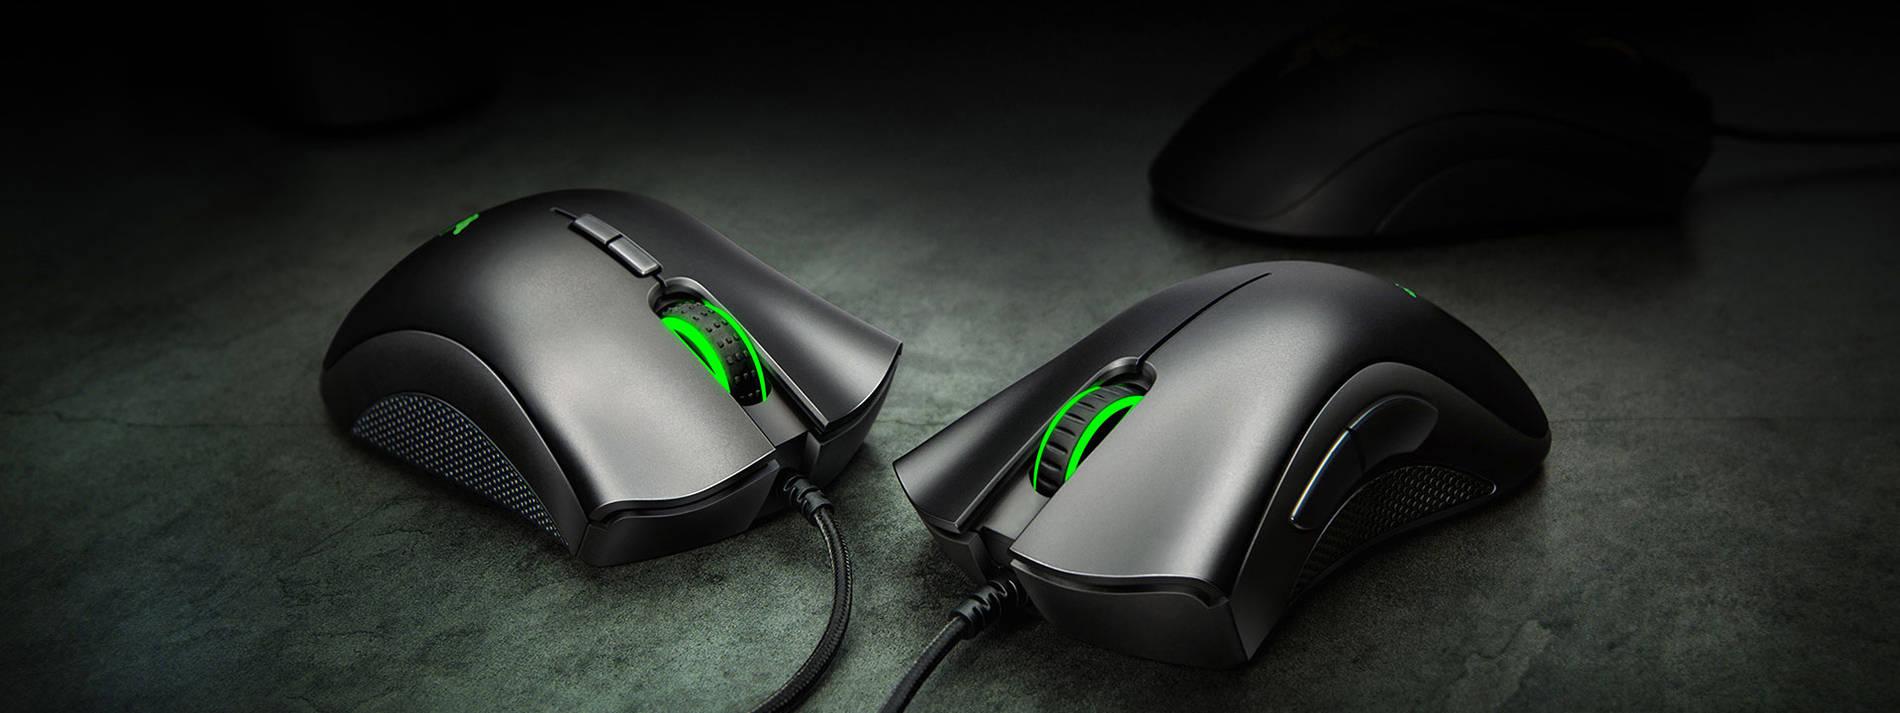 две мышки